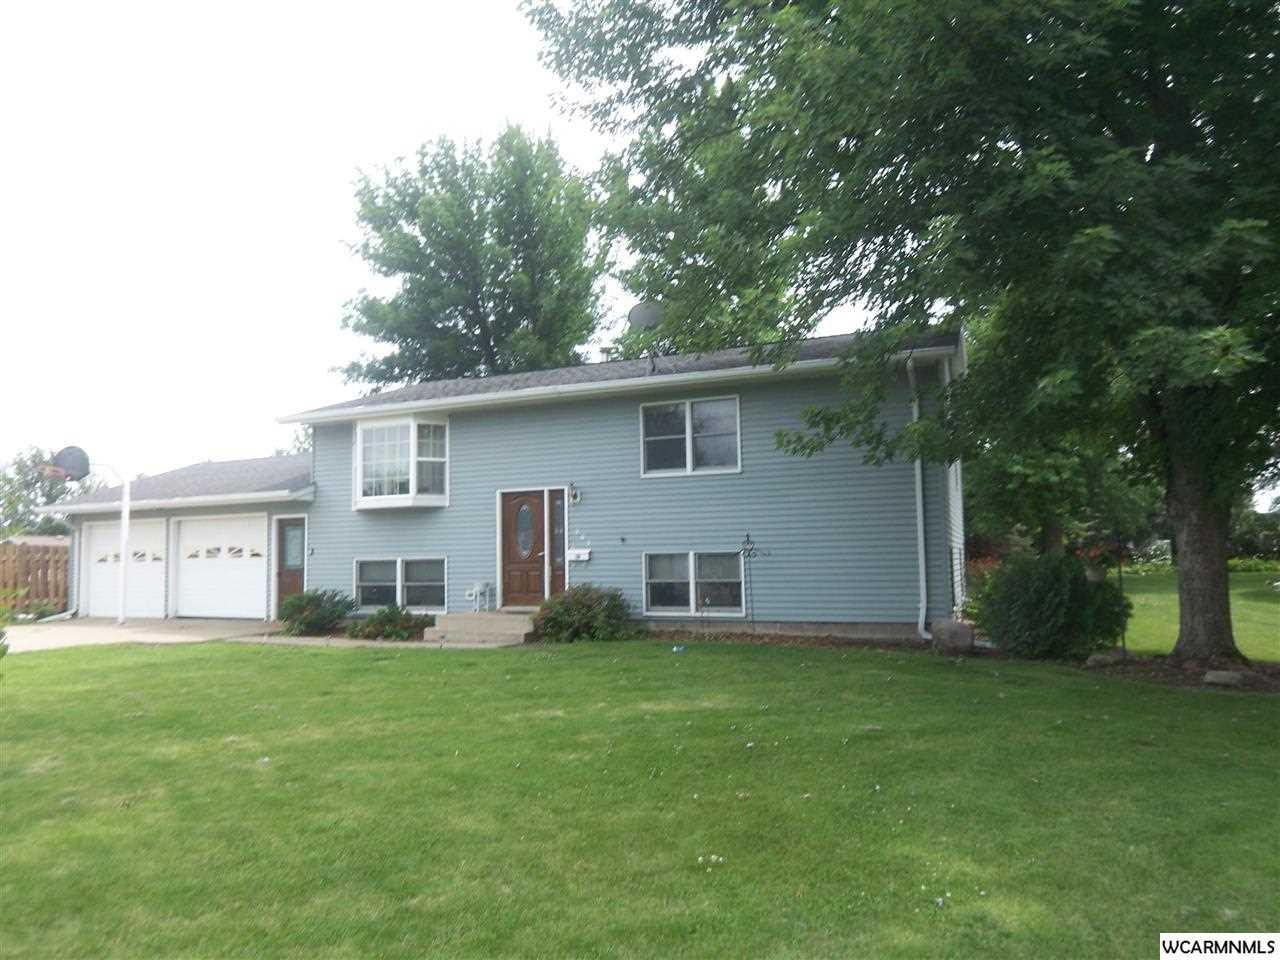 Real Estate for Sale, ListingId: 31803875, Tyler,MN56178